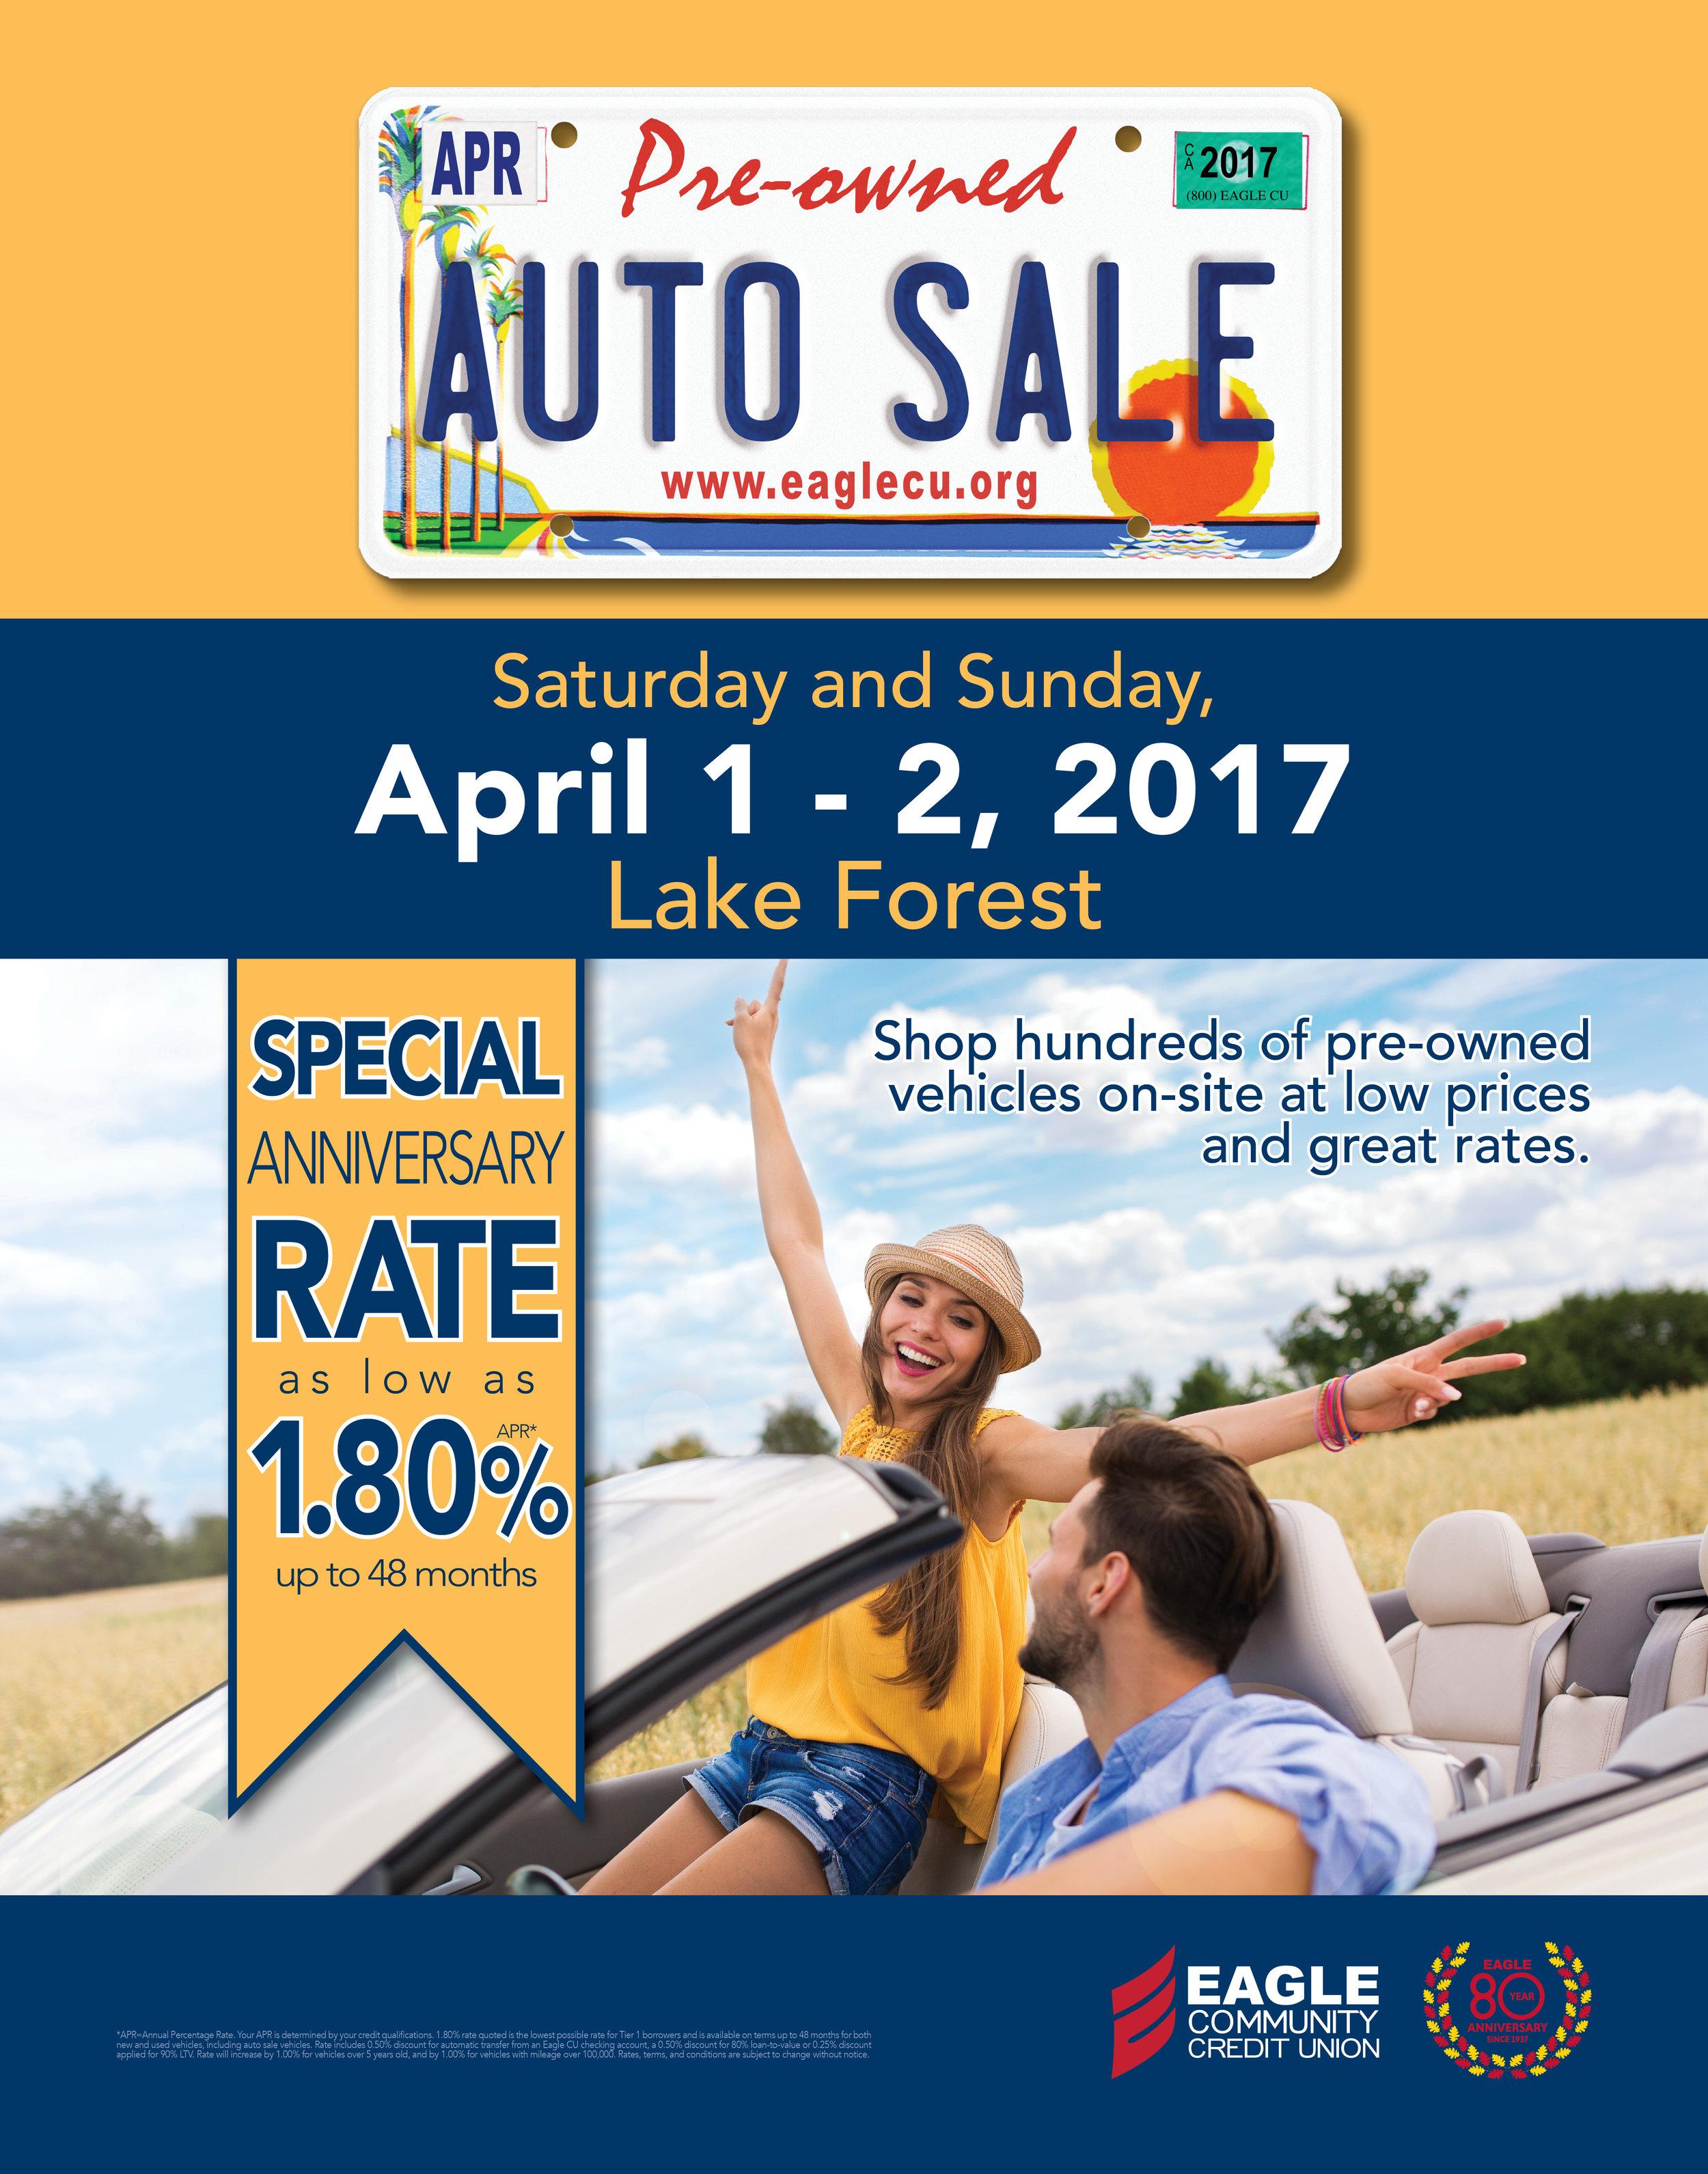 2017 Auto Sale Poster 22x28.jpg